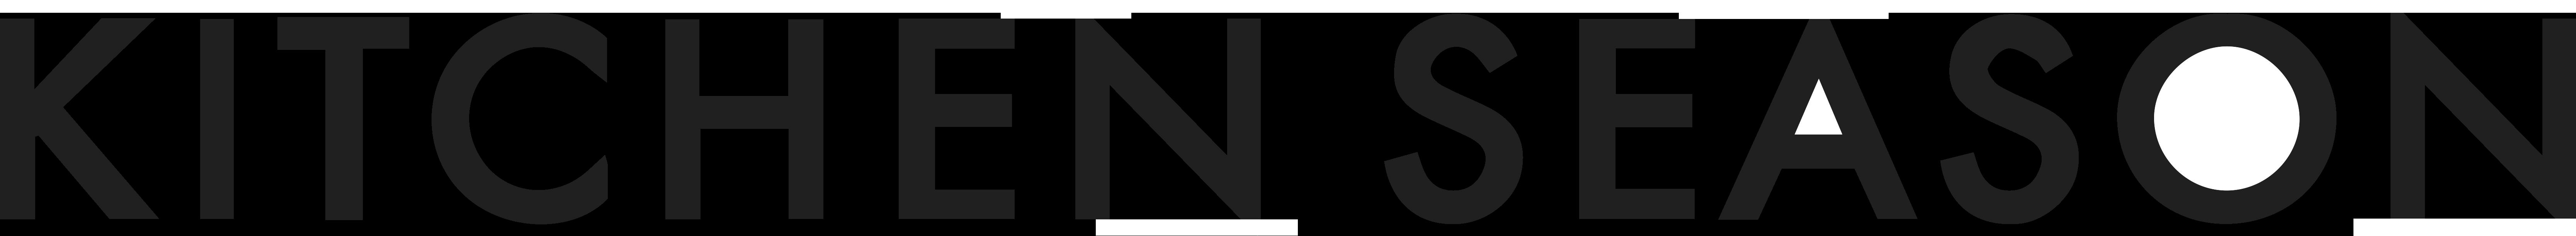 Kitchen Season Logo Dark